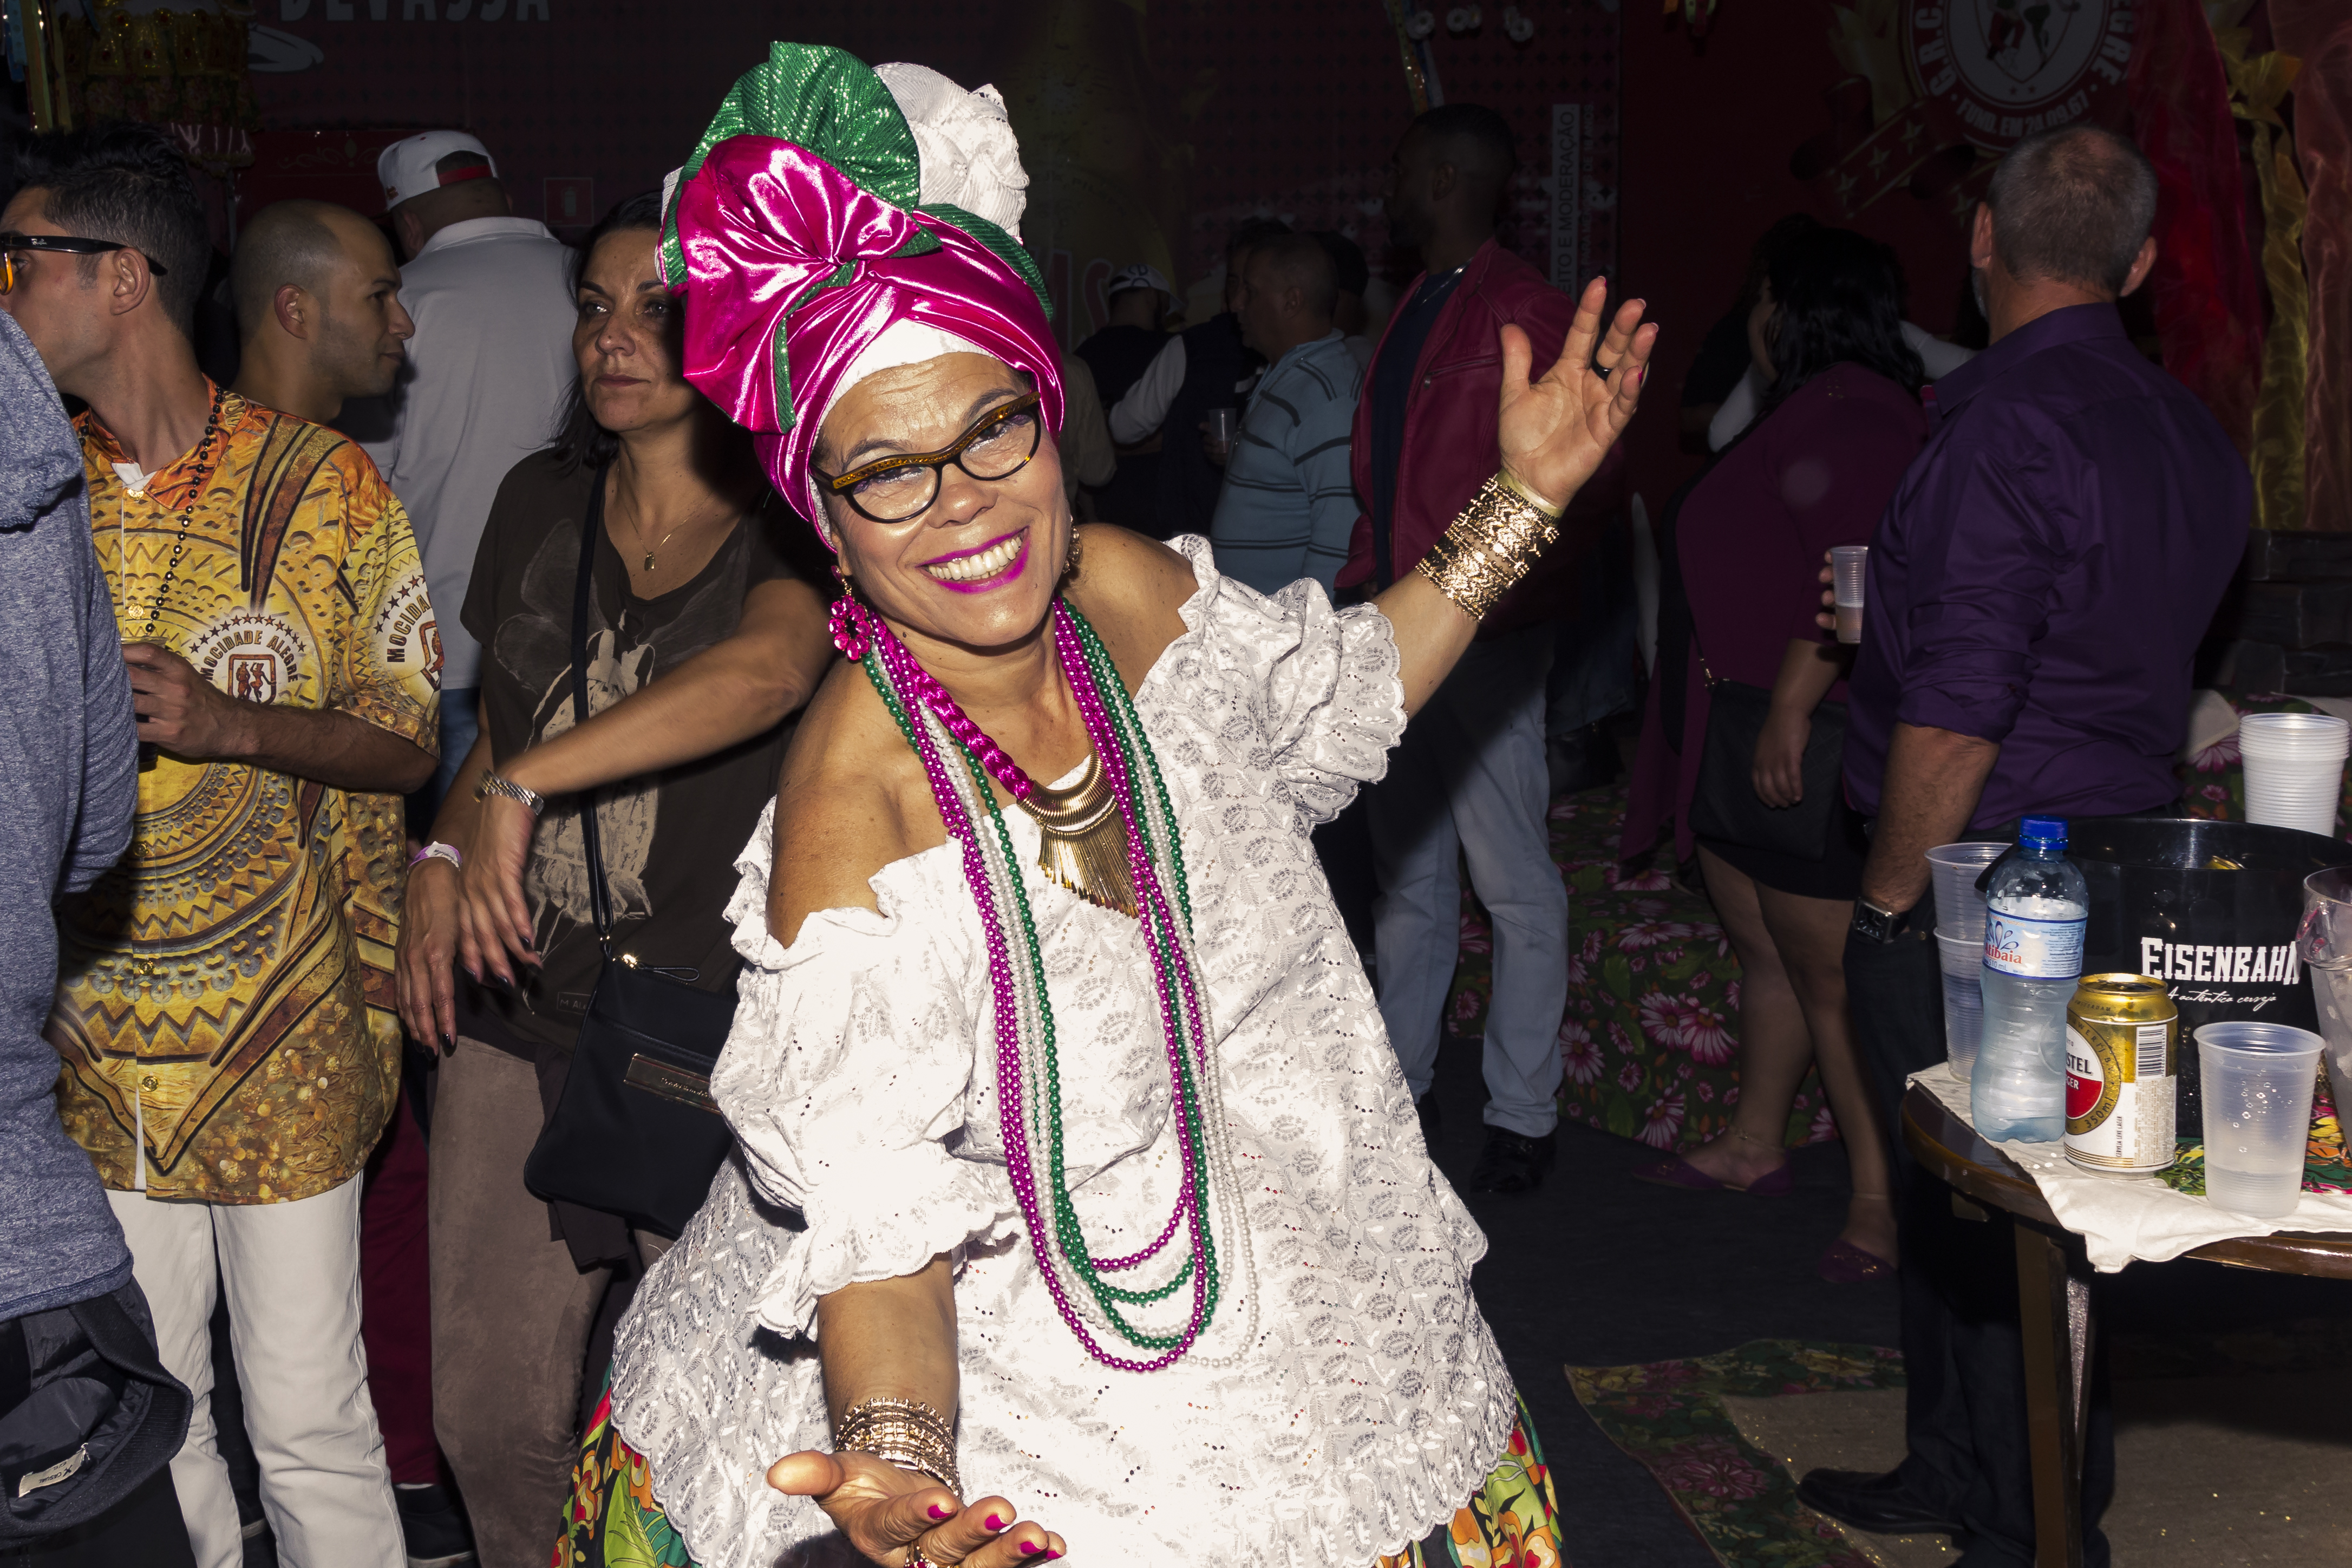 Festa de lançamento do enredo 2018 da Mocidade Alegre. Foto: SRzd - Wadson Henrique